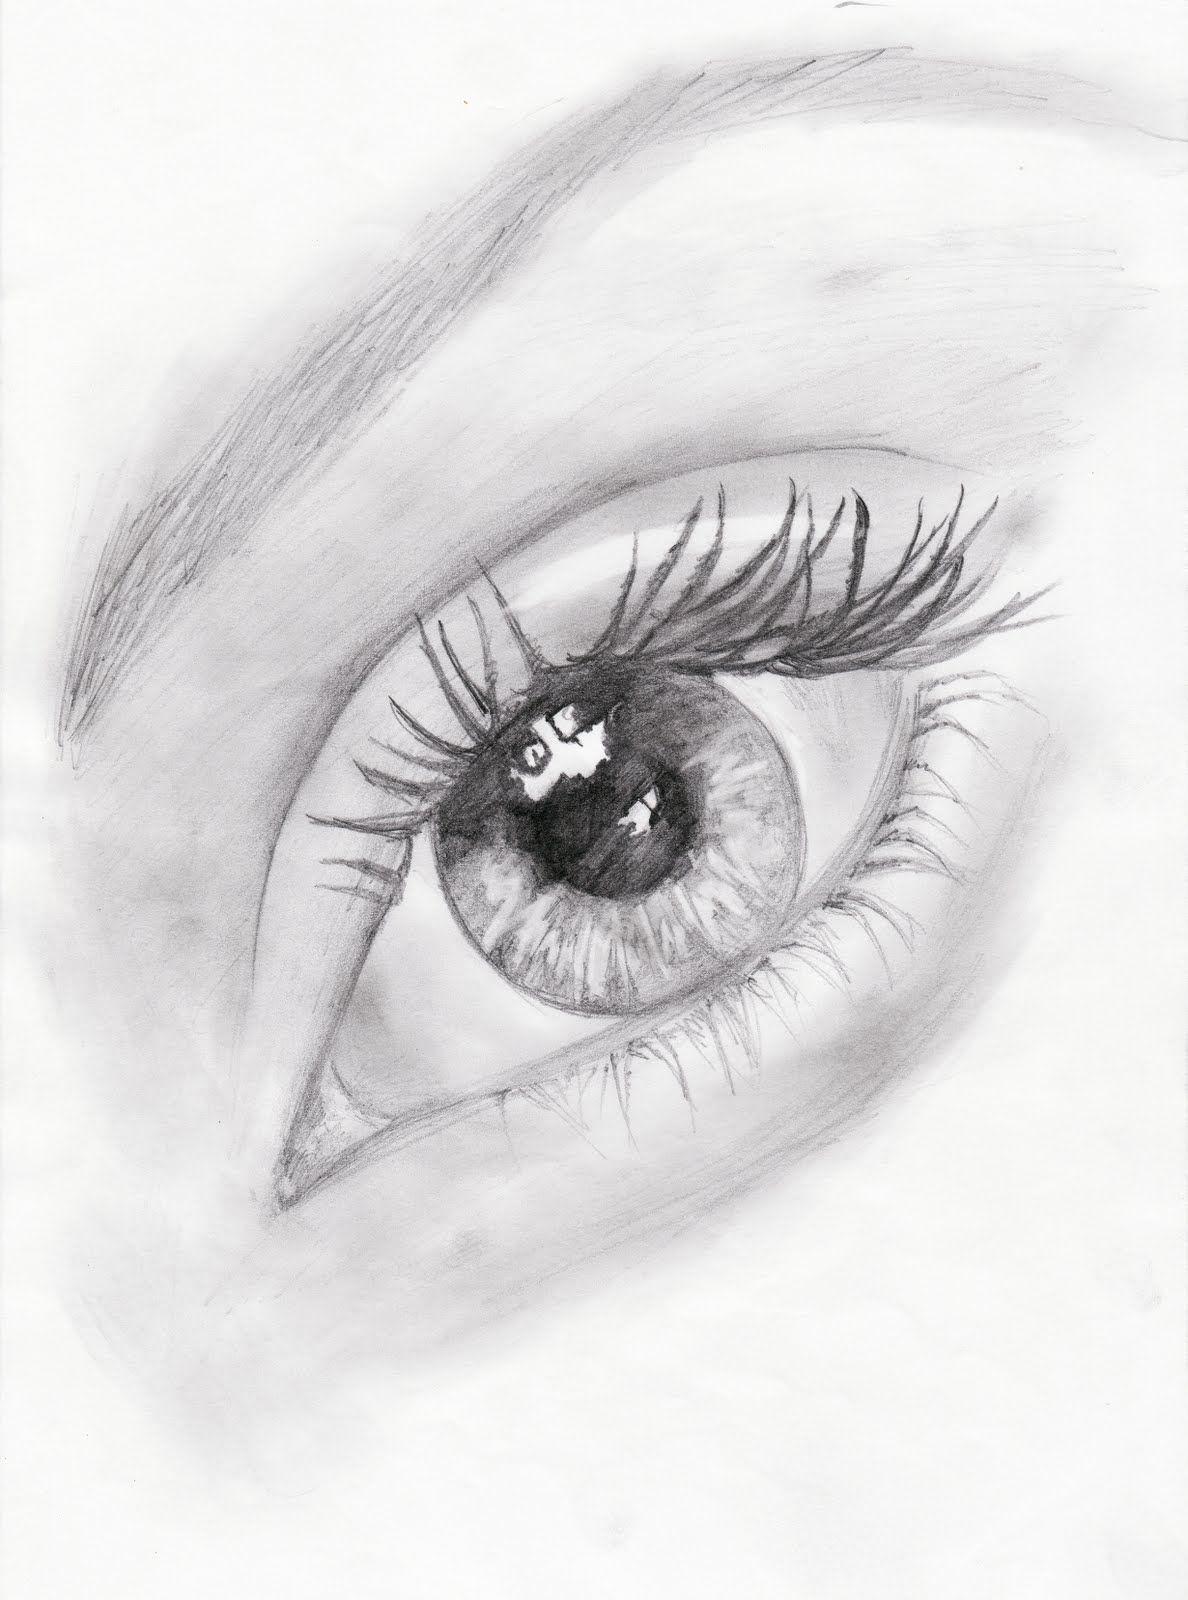 Pin De Abby En Dibujos Dibujos A Lapiz Dibujos Dibujos De Ojos